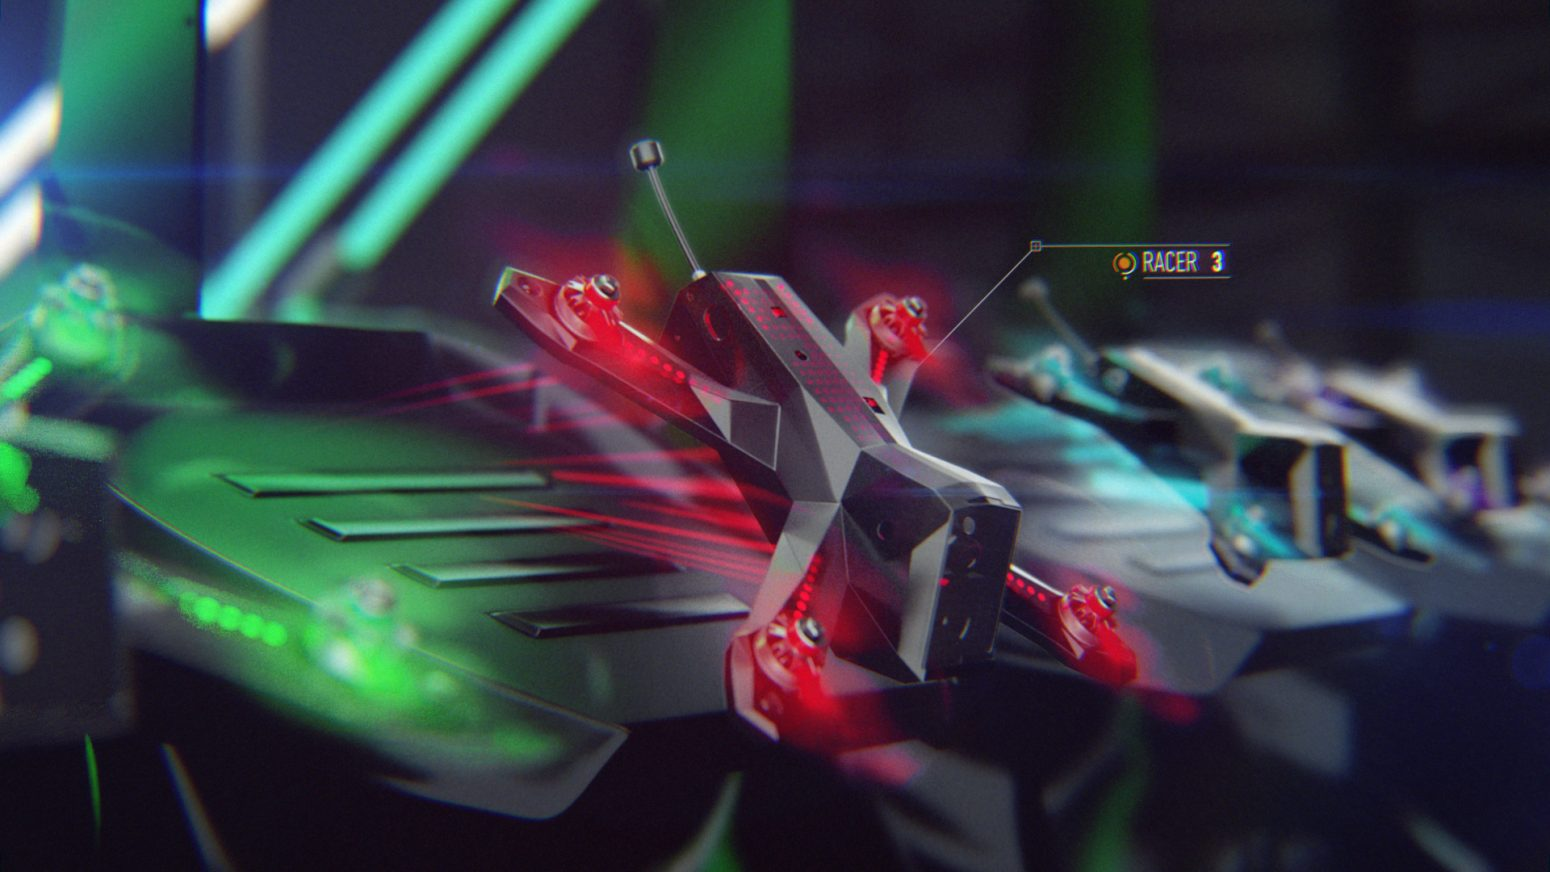 dazzle ship design motion studio broadcast gaming music drone racing league 2017